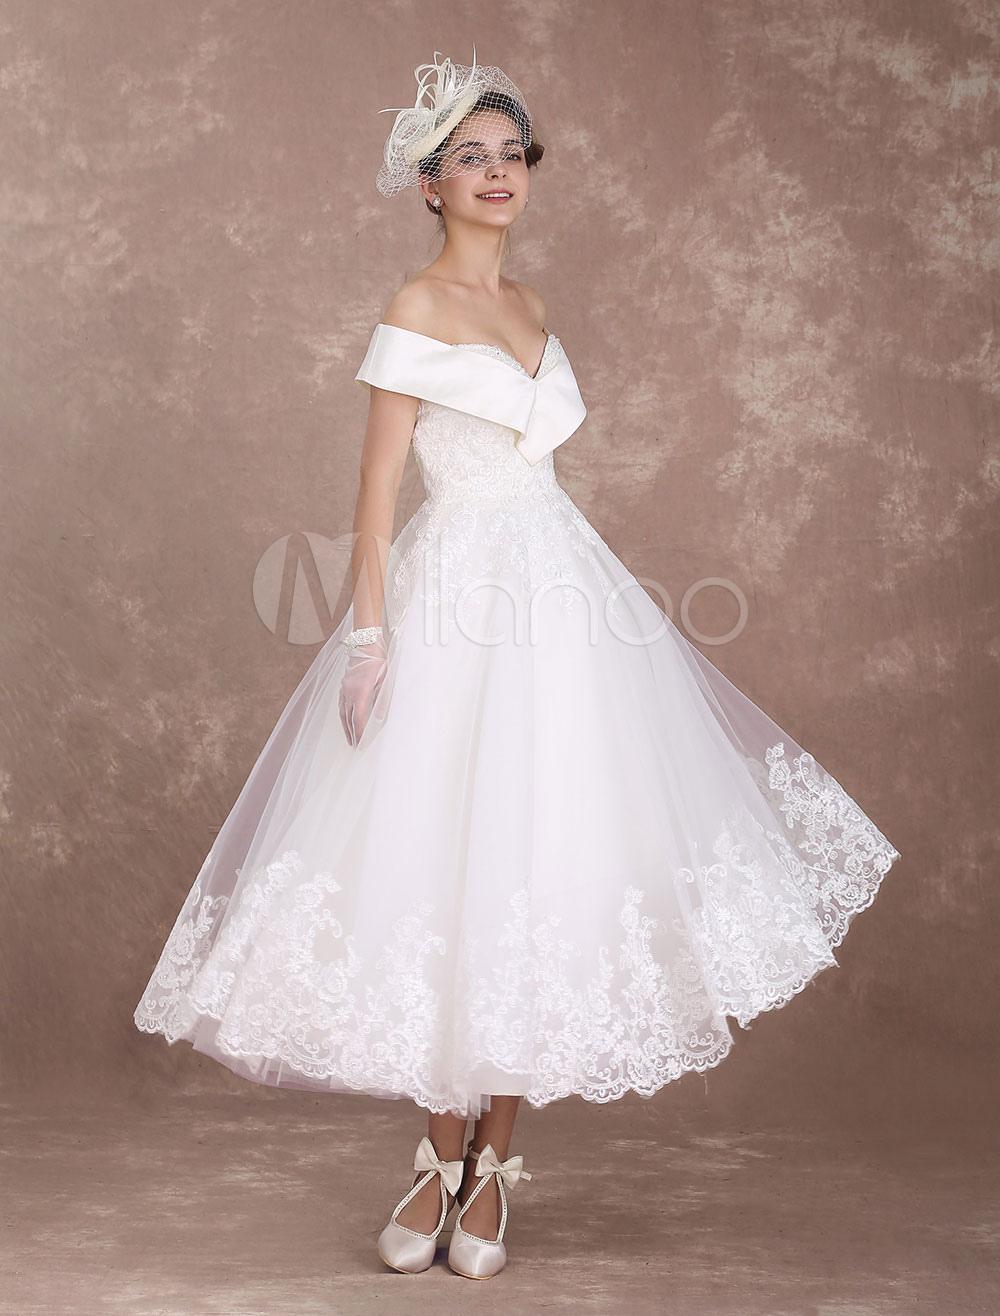 1950s wedding dresses for sale photo - 1